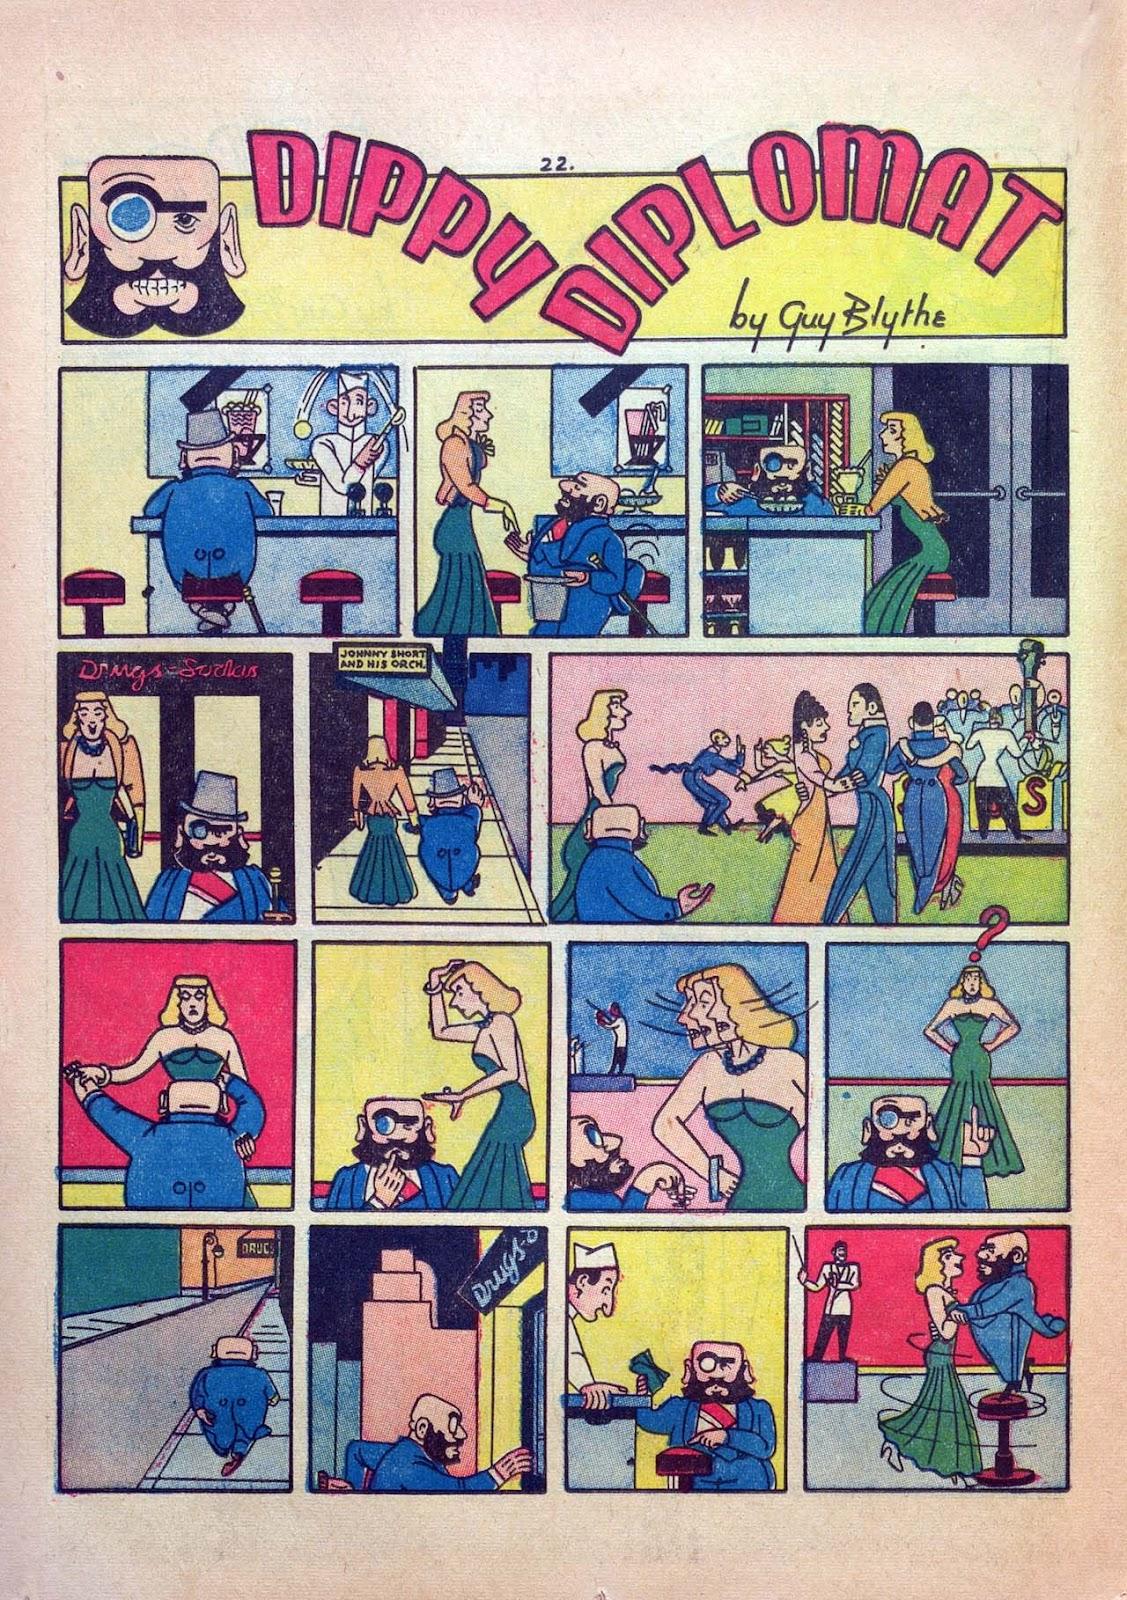 Read online Joker Comics comic -  Issue #2 - 24